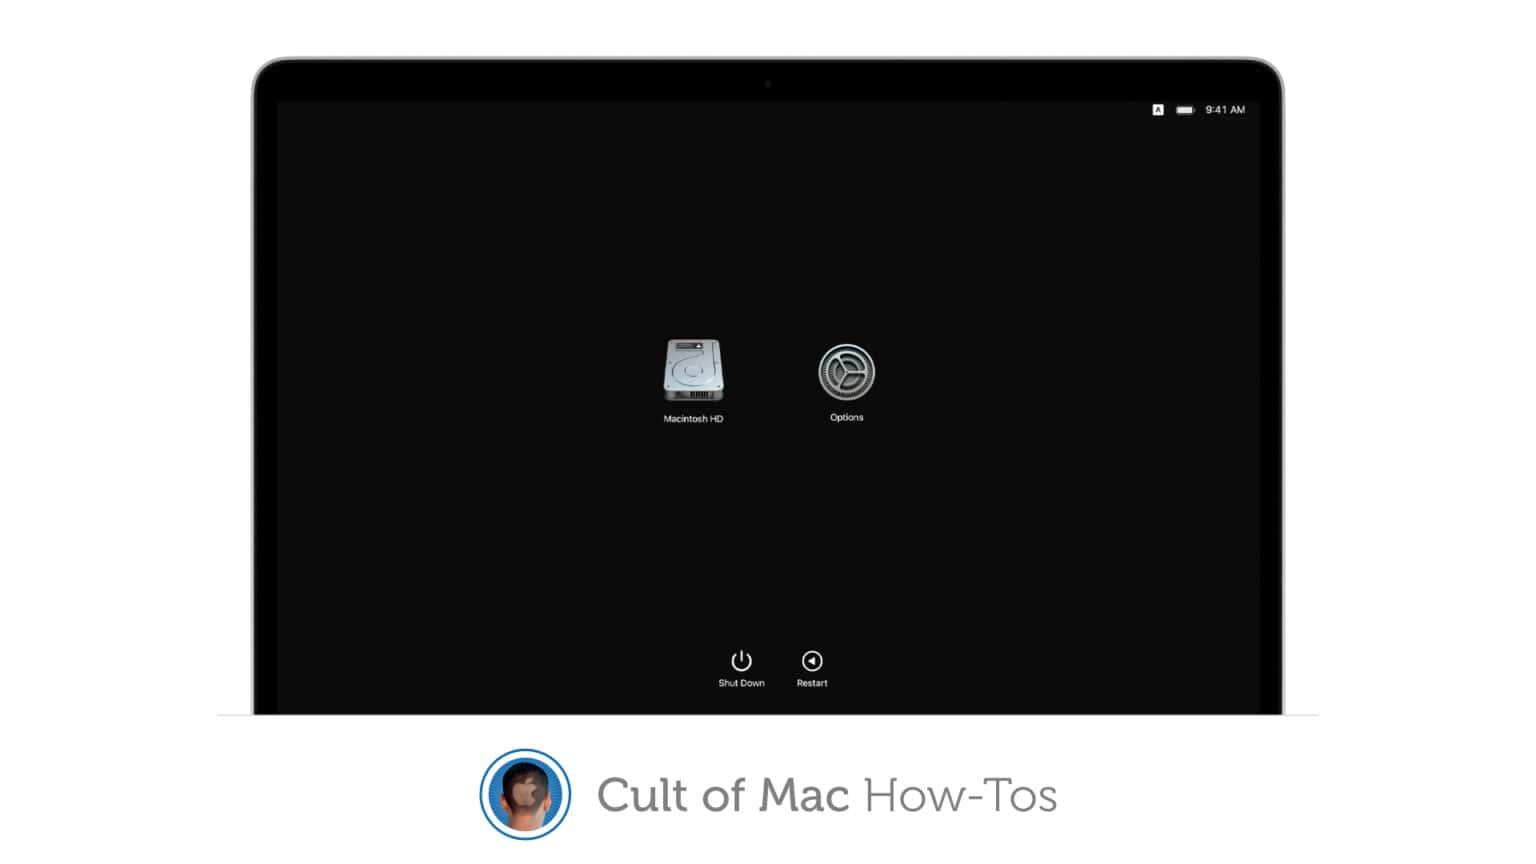 reinstall errors on M1 Macs